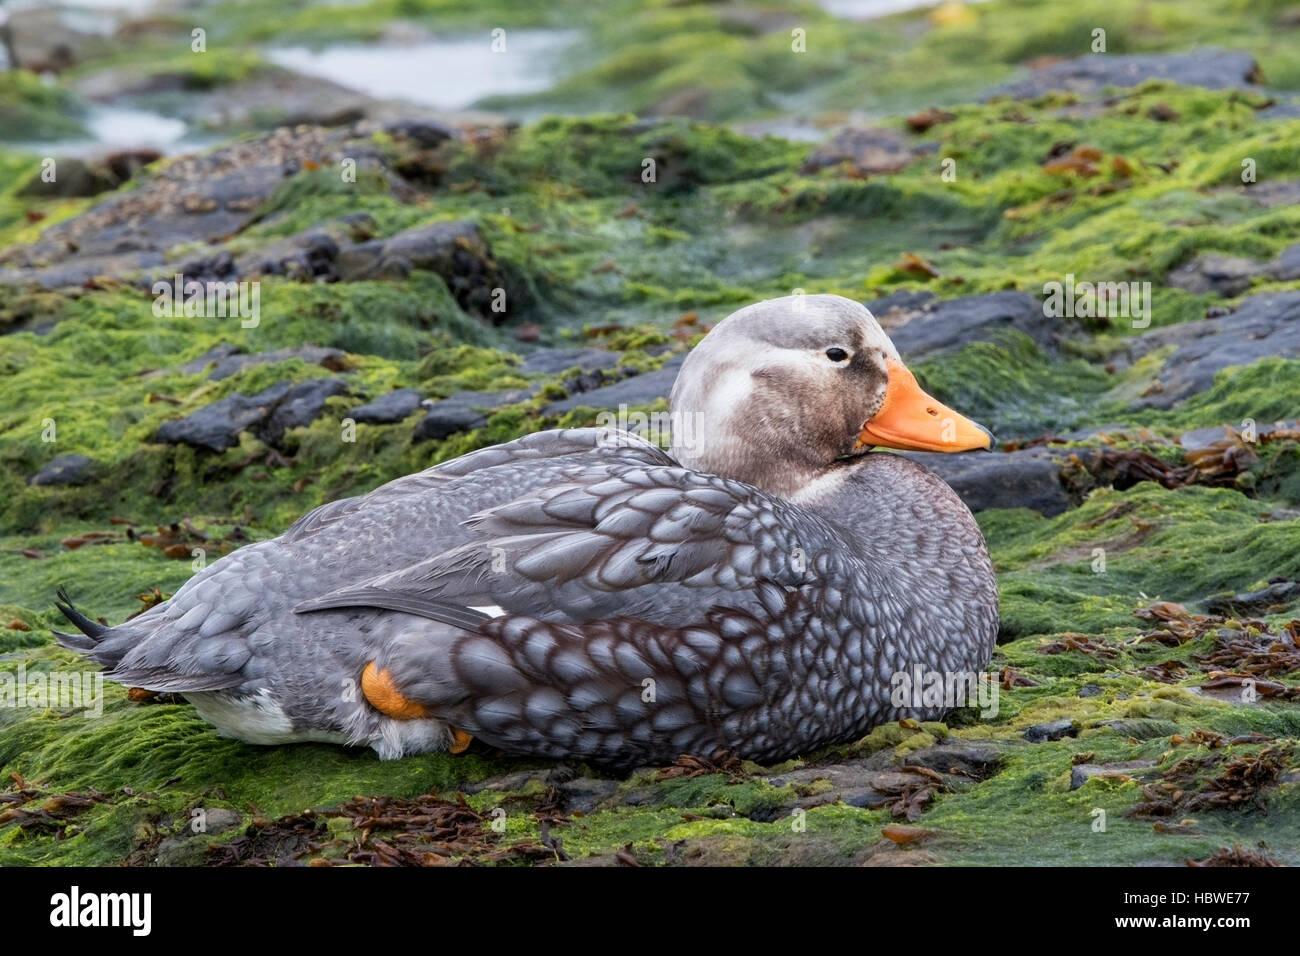 Falkland islands flightless steamer duck (Tachyeres brachypterus) adult male resting on seaweed covered rocks, Falkland - Stock Image